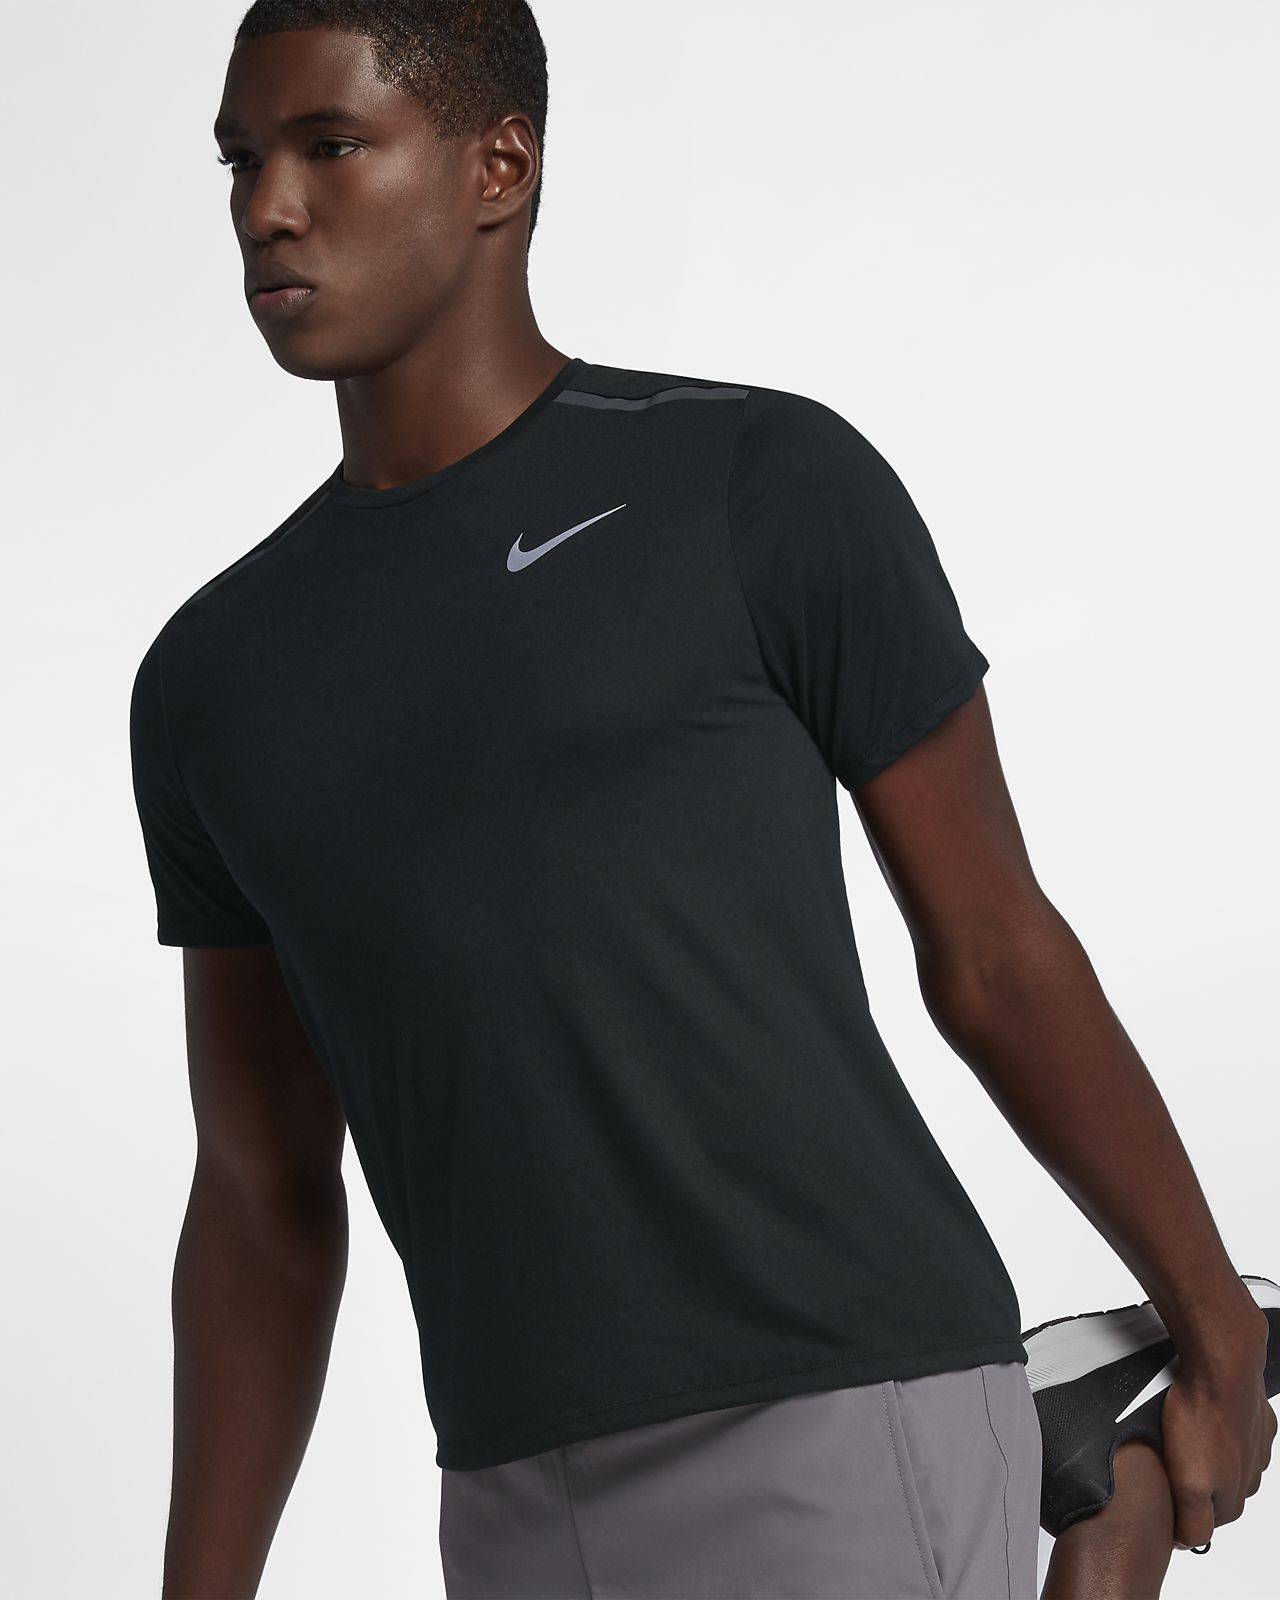 ... Nike Dri-FIT Rise 365 Men's Short-Sleeve Running Top